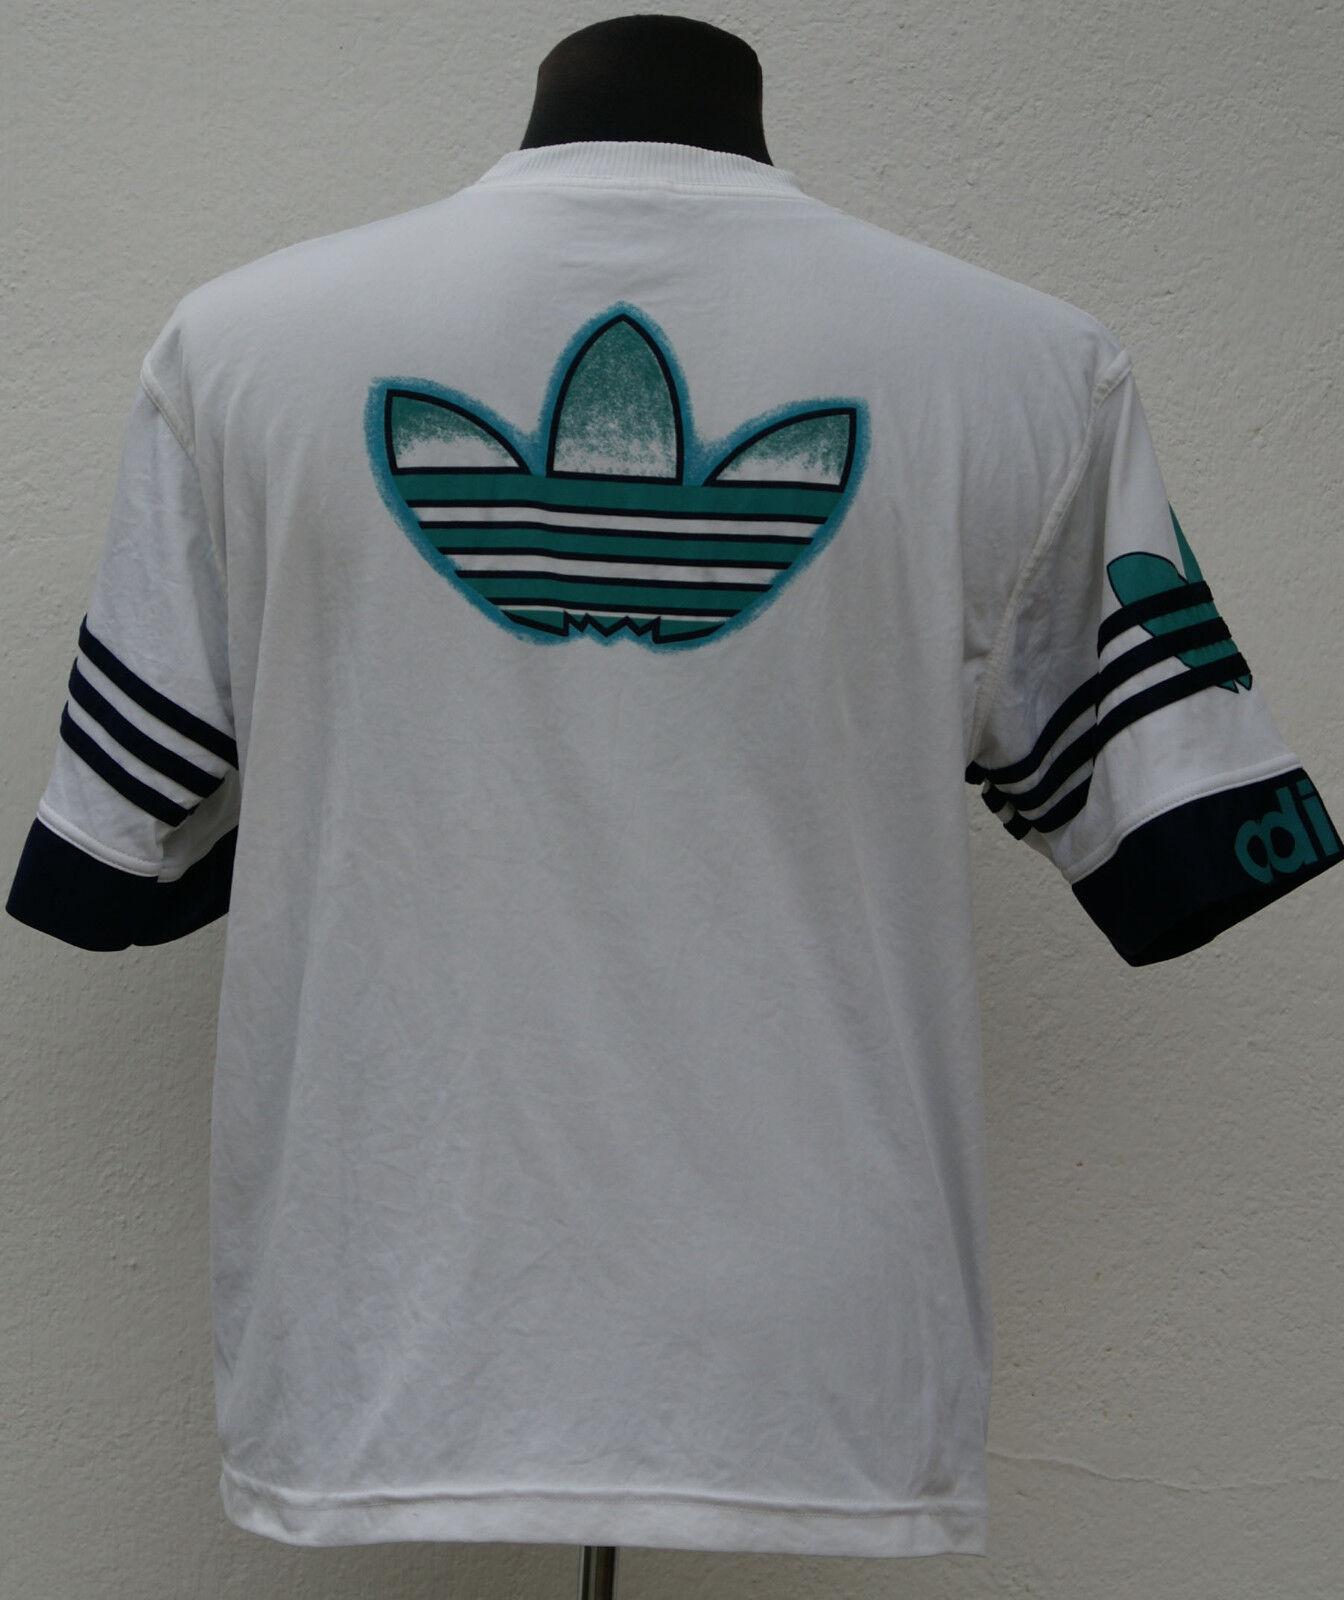 VTG Vintage '80 Adidas W Germany hip hop t-shirt tee sz L (large)